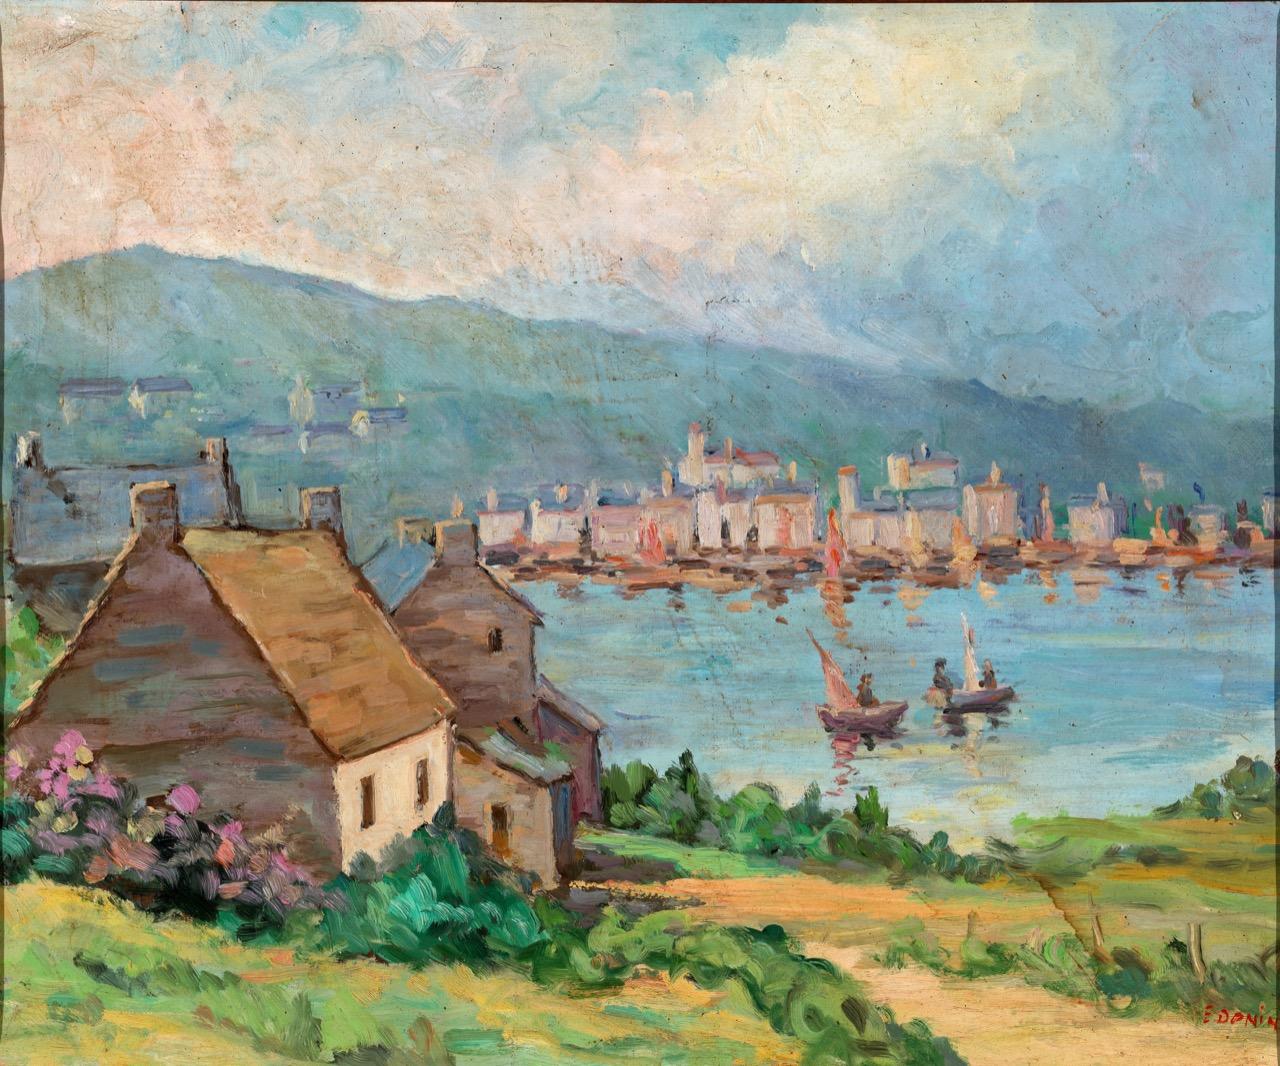 Golfo in Bretagna, anni '60, olio su tela, 54x73 cm